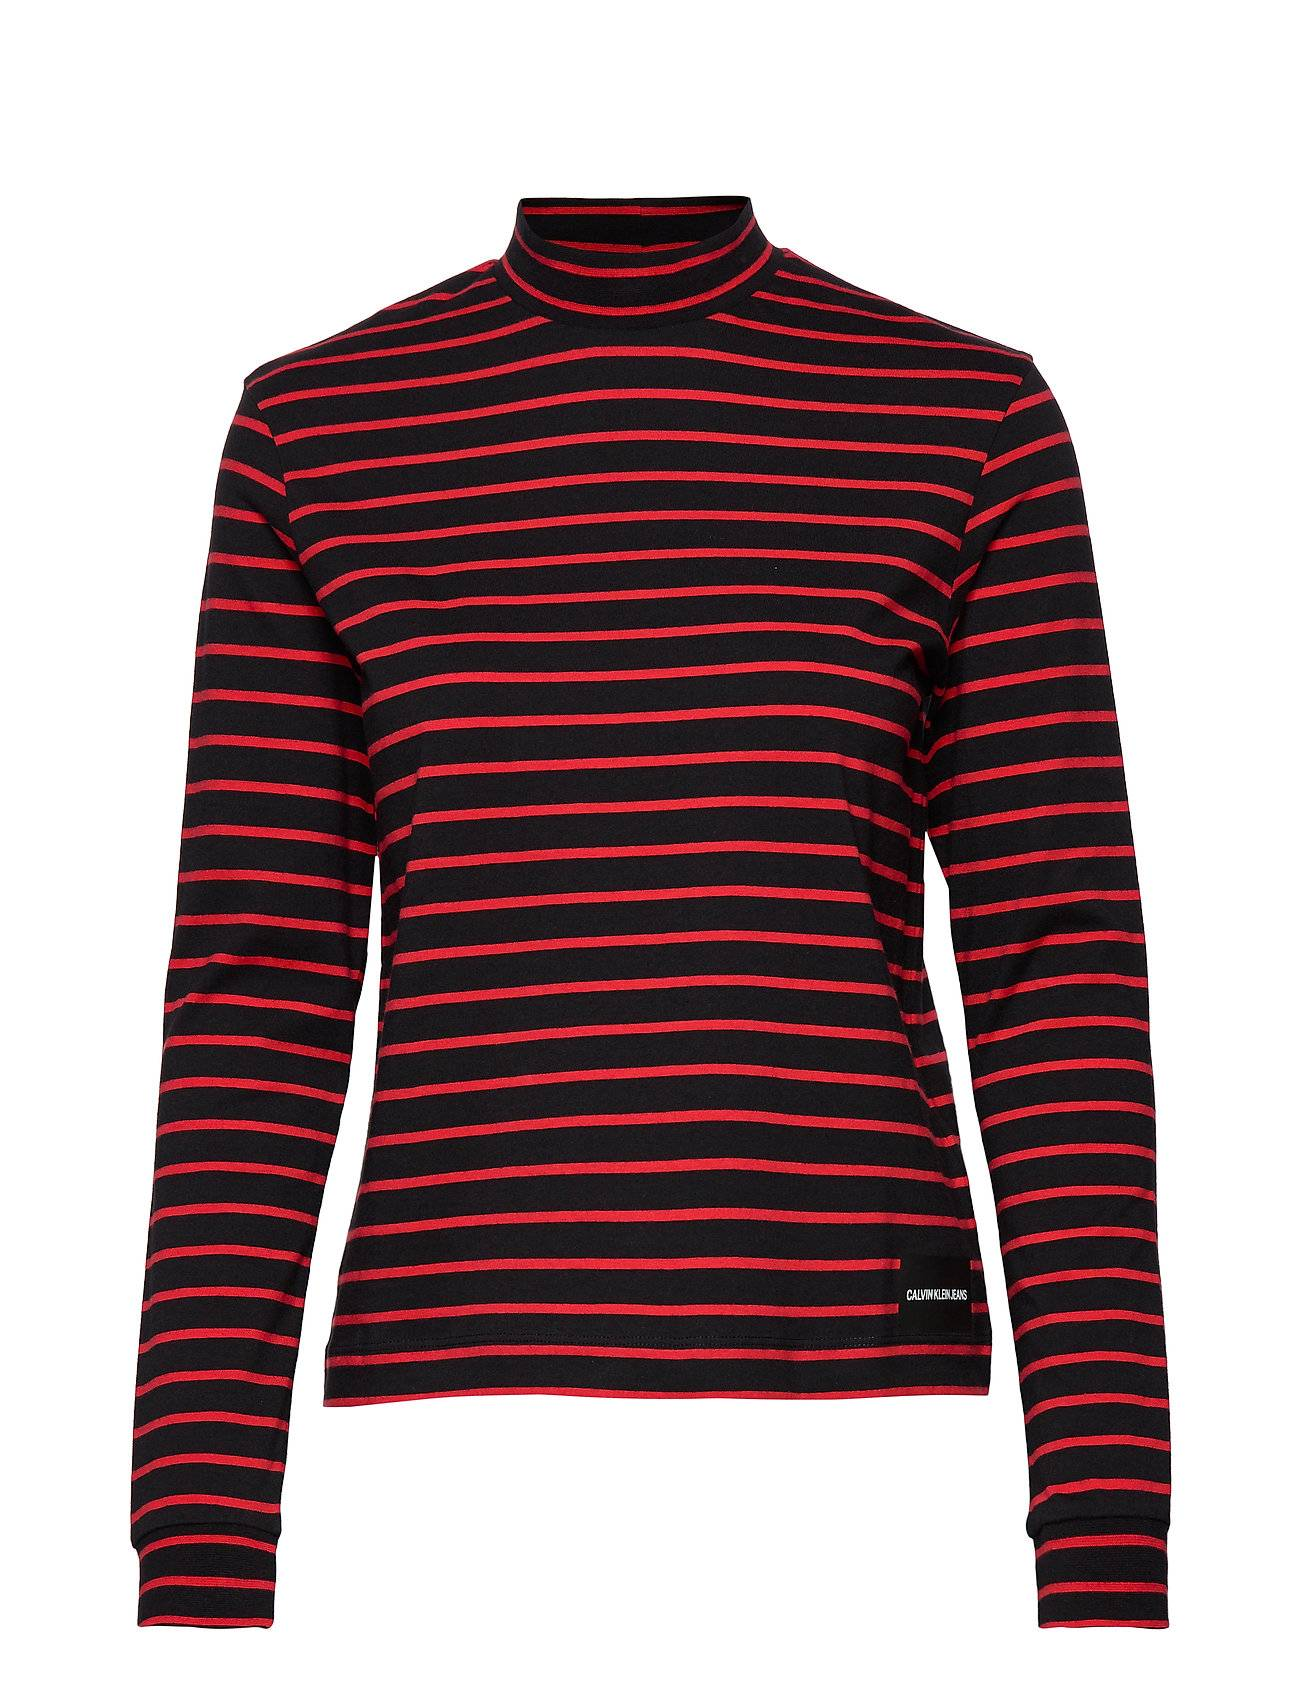 Image of Calvin Mock Neck Ls Tee T-shirts & Tops Long-sleeved Monivärinen/Kuvioitu